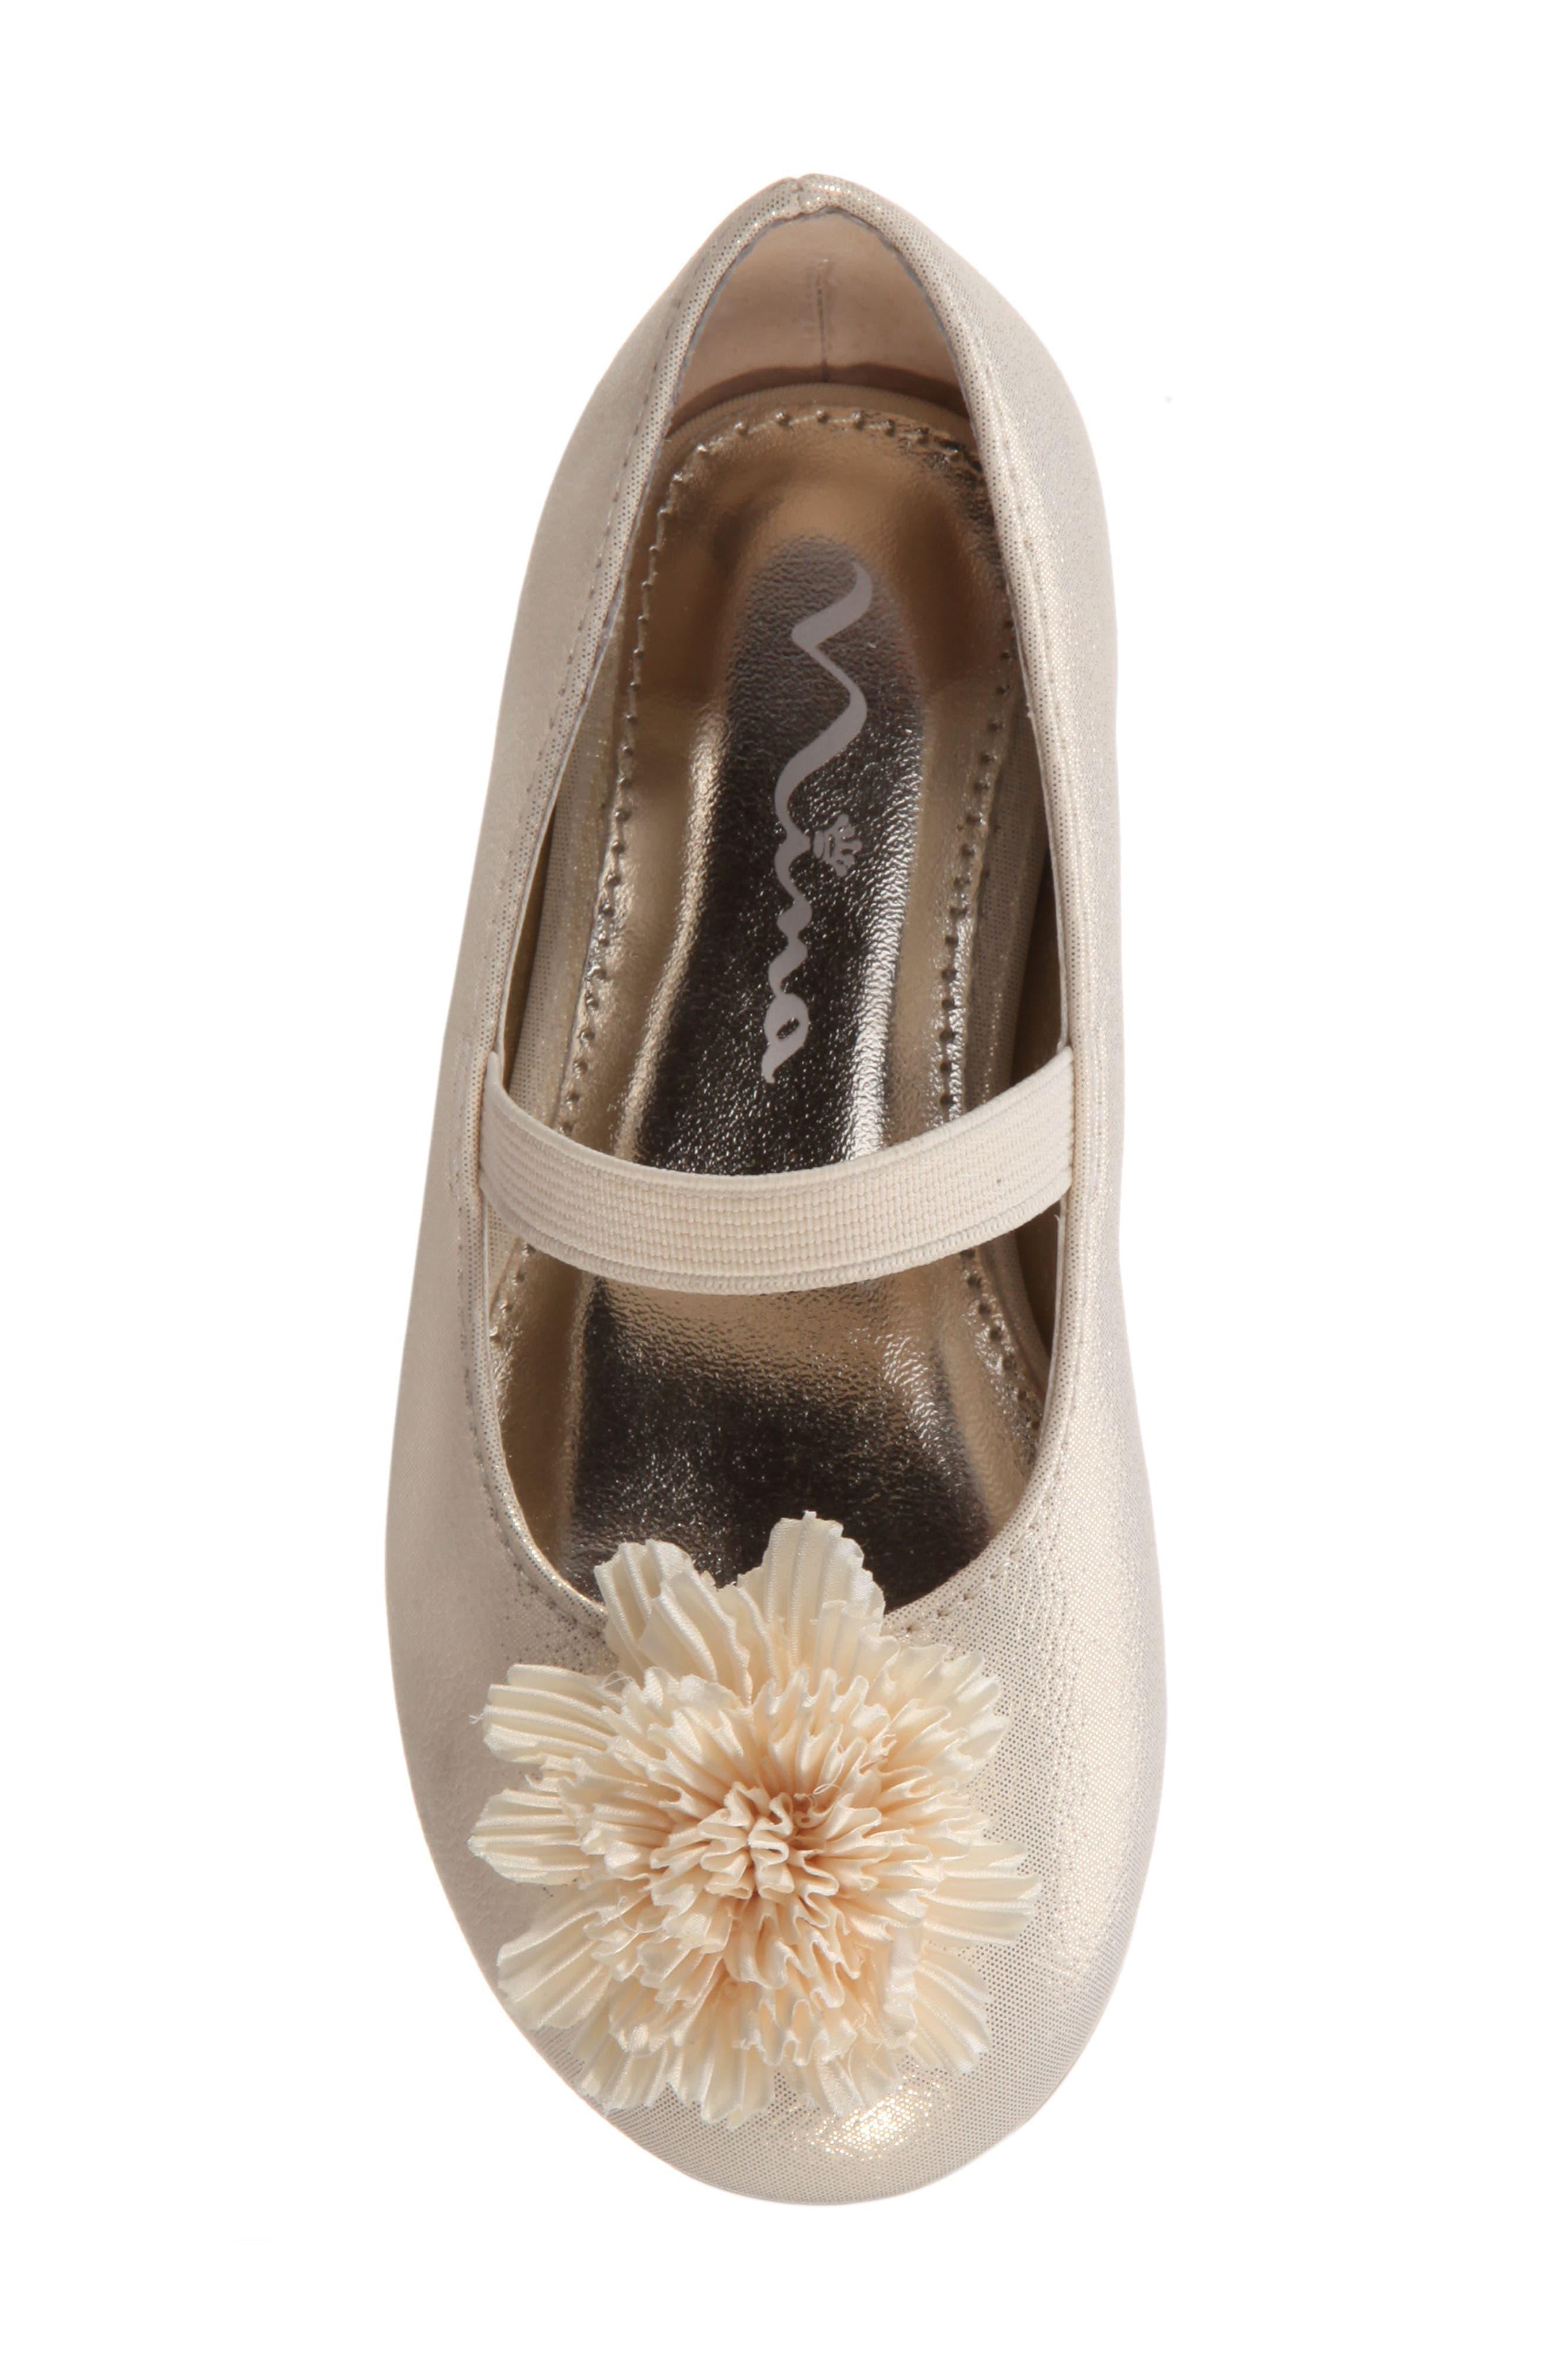 Jemma-T Bow Ballet Flat,                             Alternate thumbnail 5, color,                             Platino Metallic